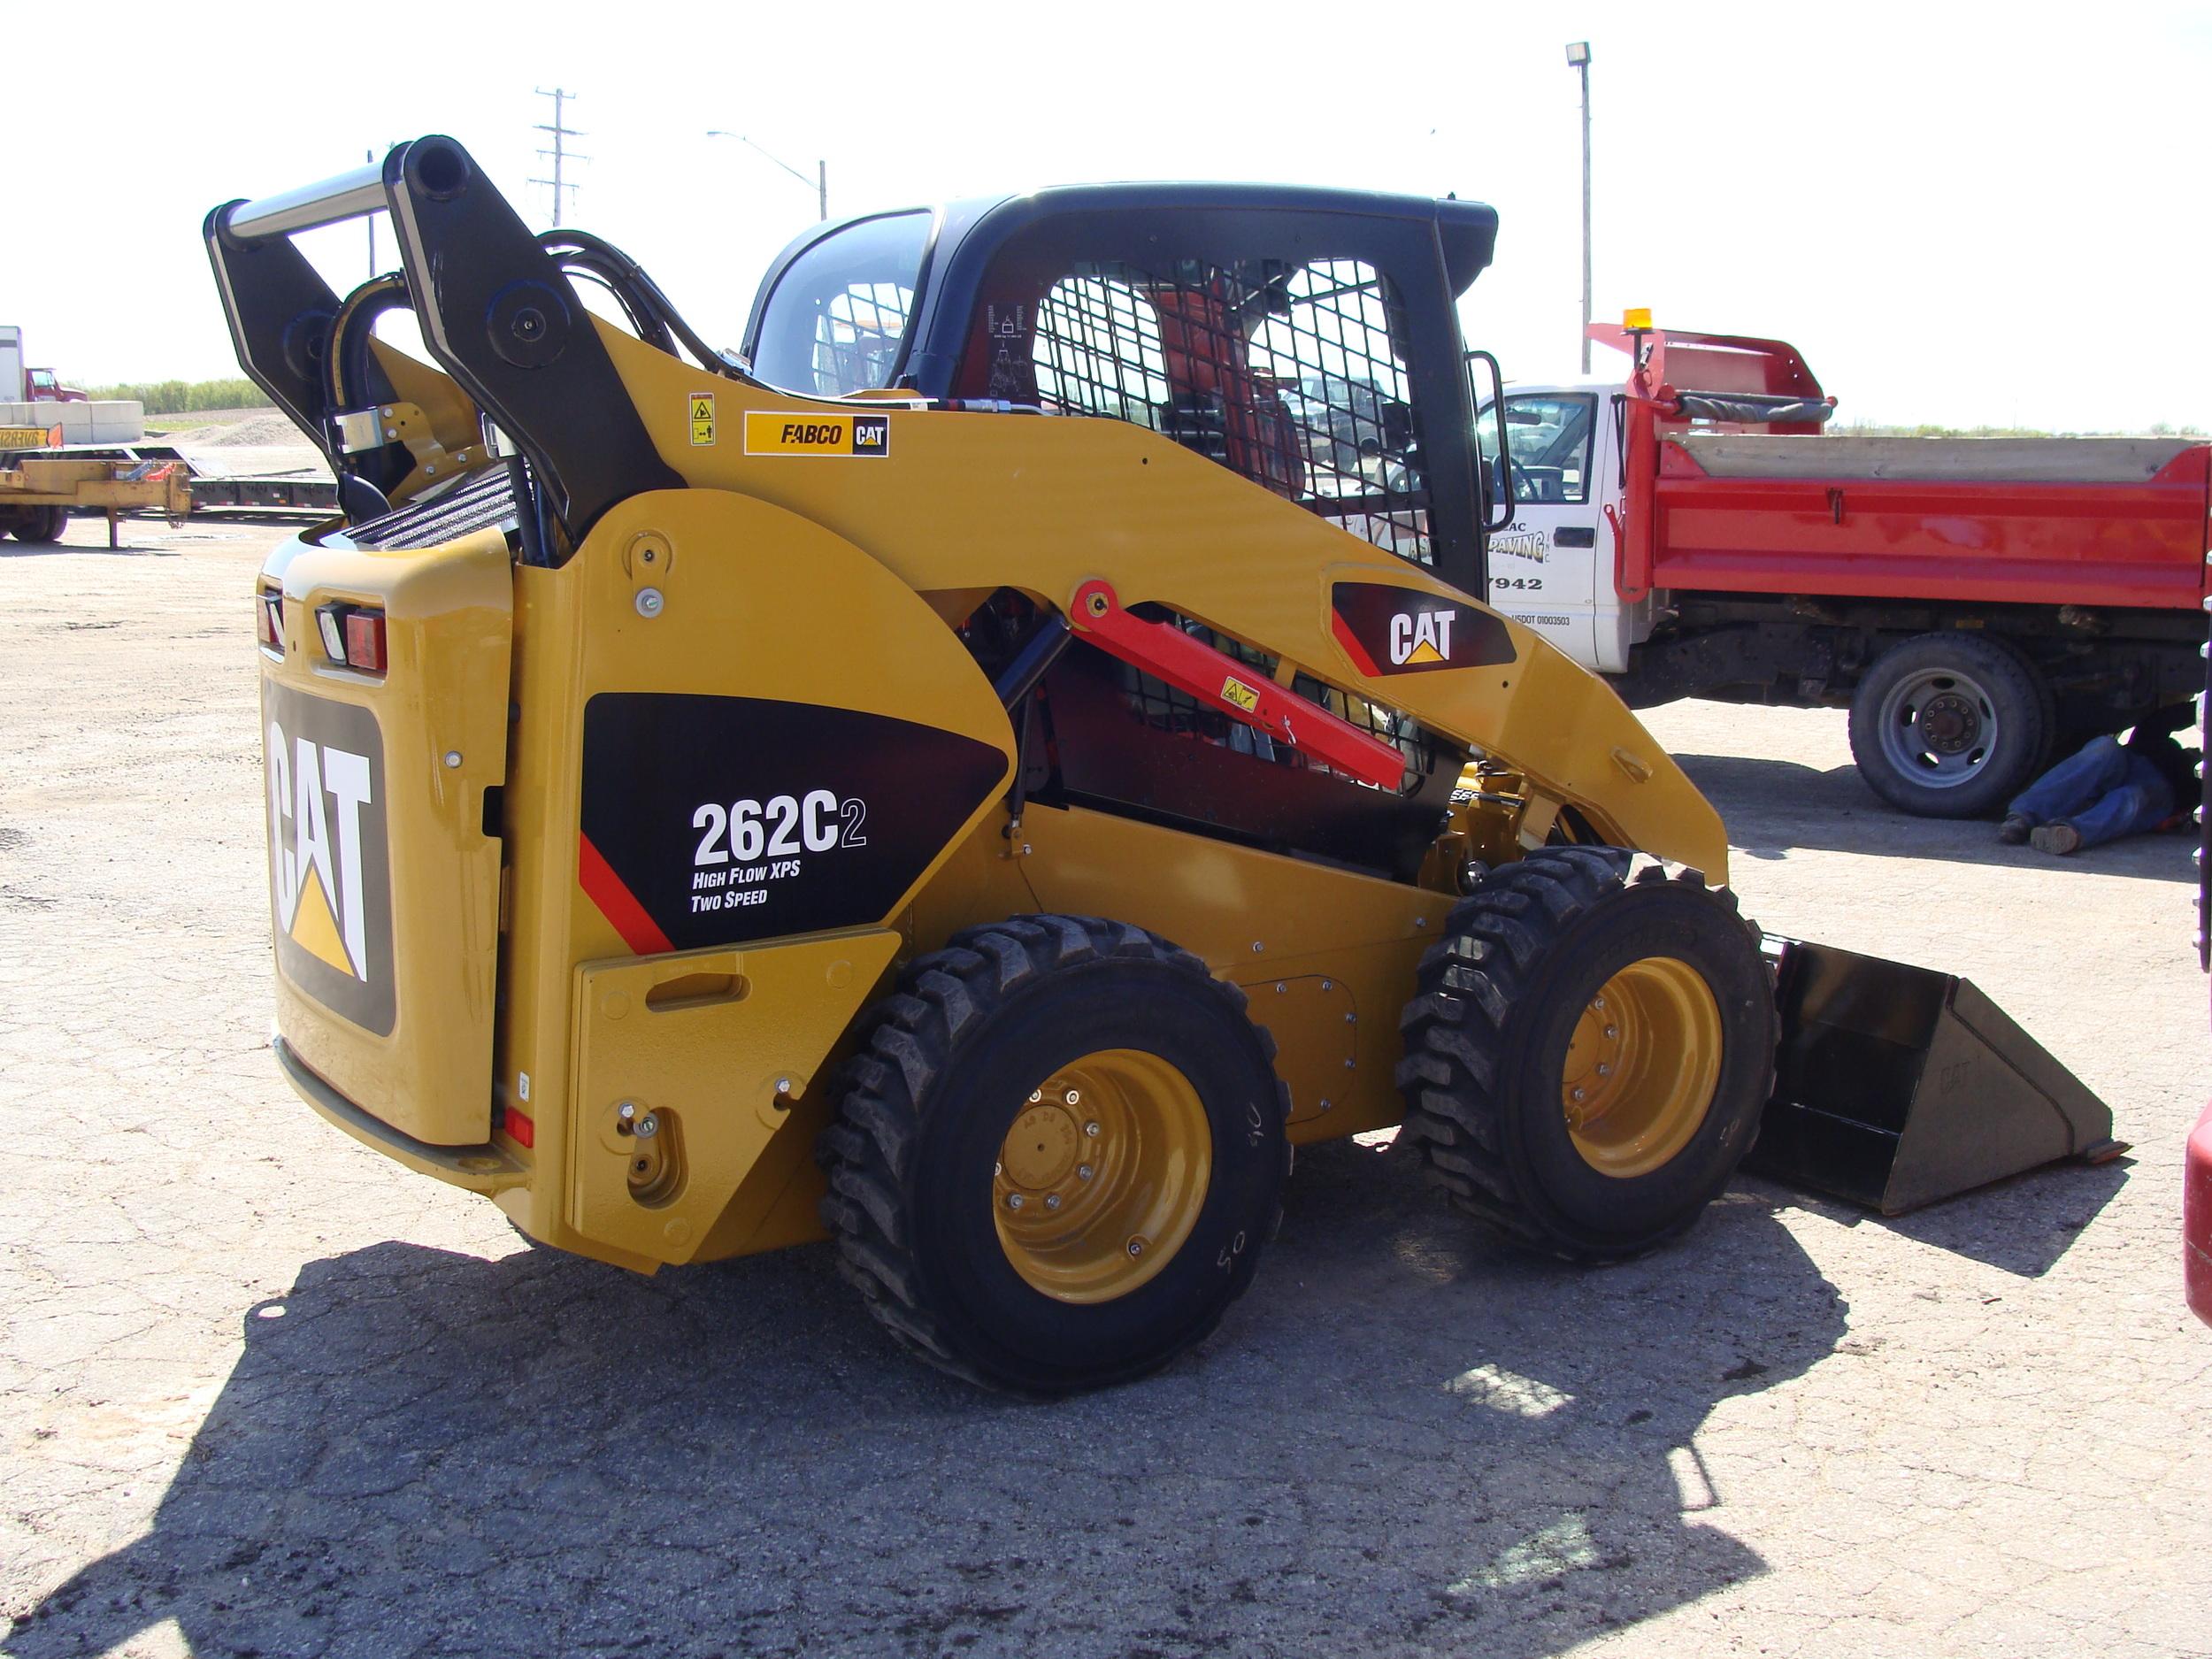 DSC03556.JPG